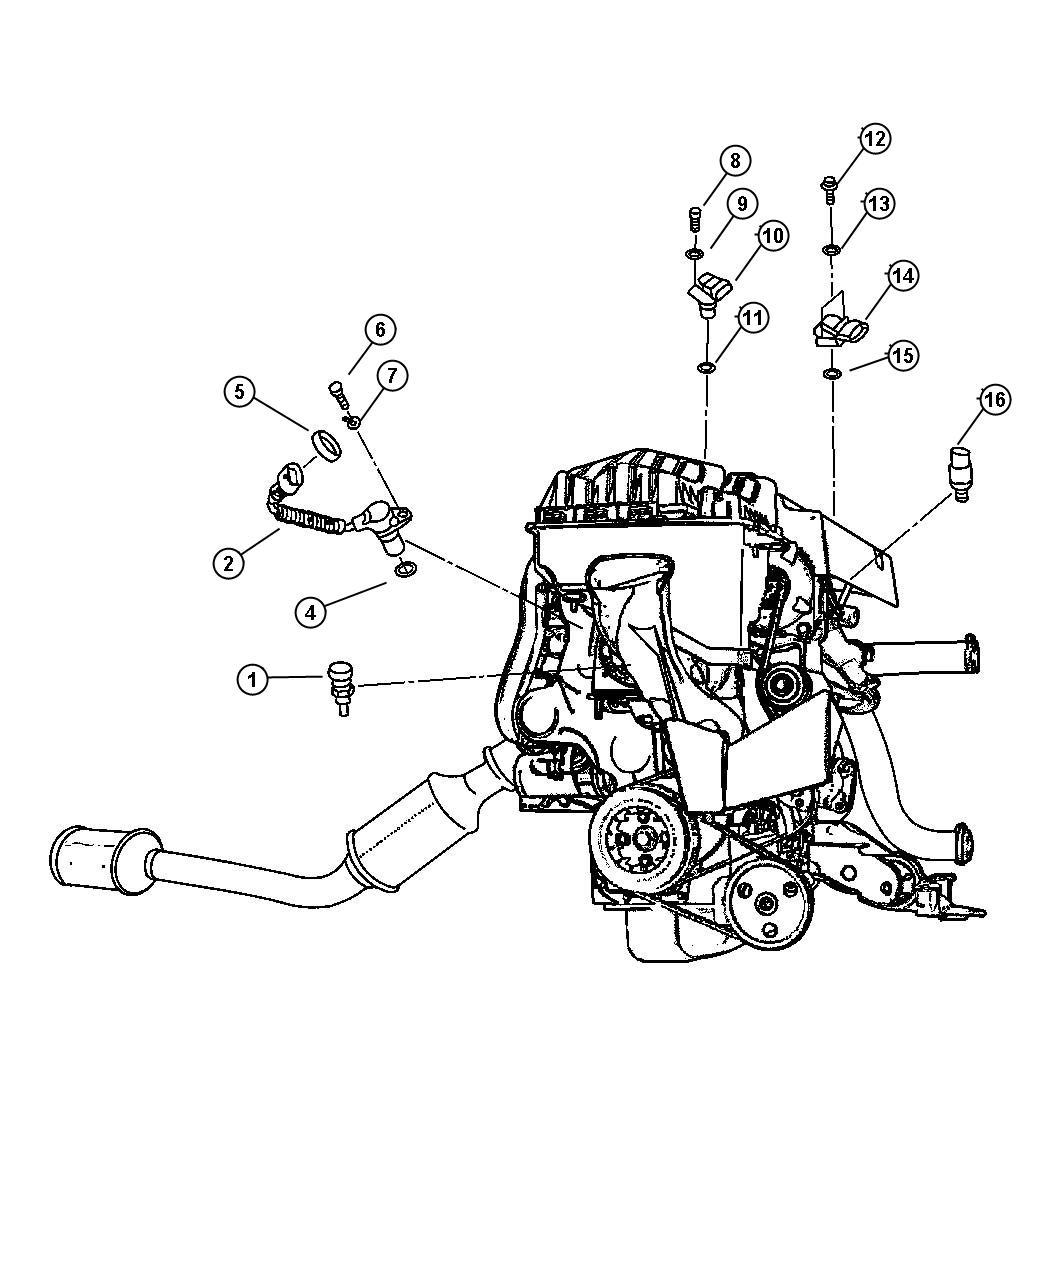 tags: #chrysler flathead 8 cylinder engine#chrysler v12 tank engine#chrysler  engine replacement#sherman chrysler engine#chrysler 225 slant six